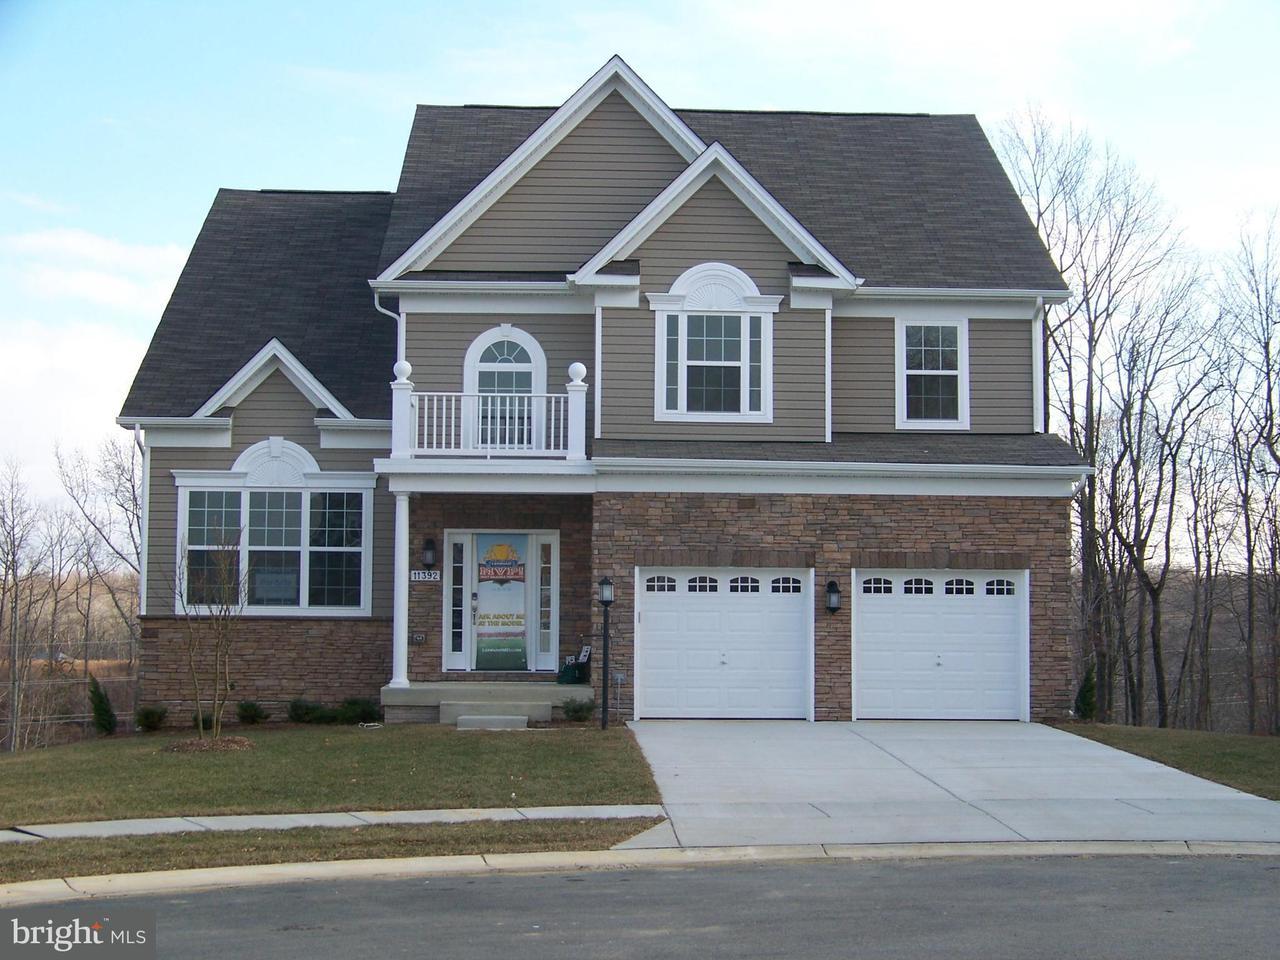 Vivienda unifamiliar por un Venta en 11392 Flag Court 11392 Flag Court White Plains, Maryland 20695 Estados Unidos